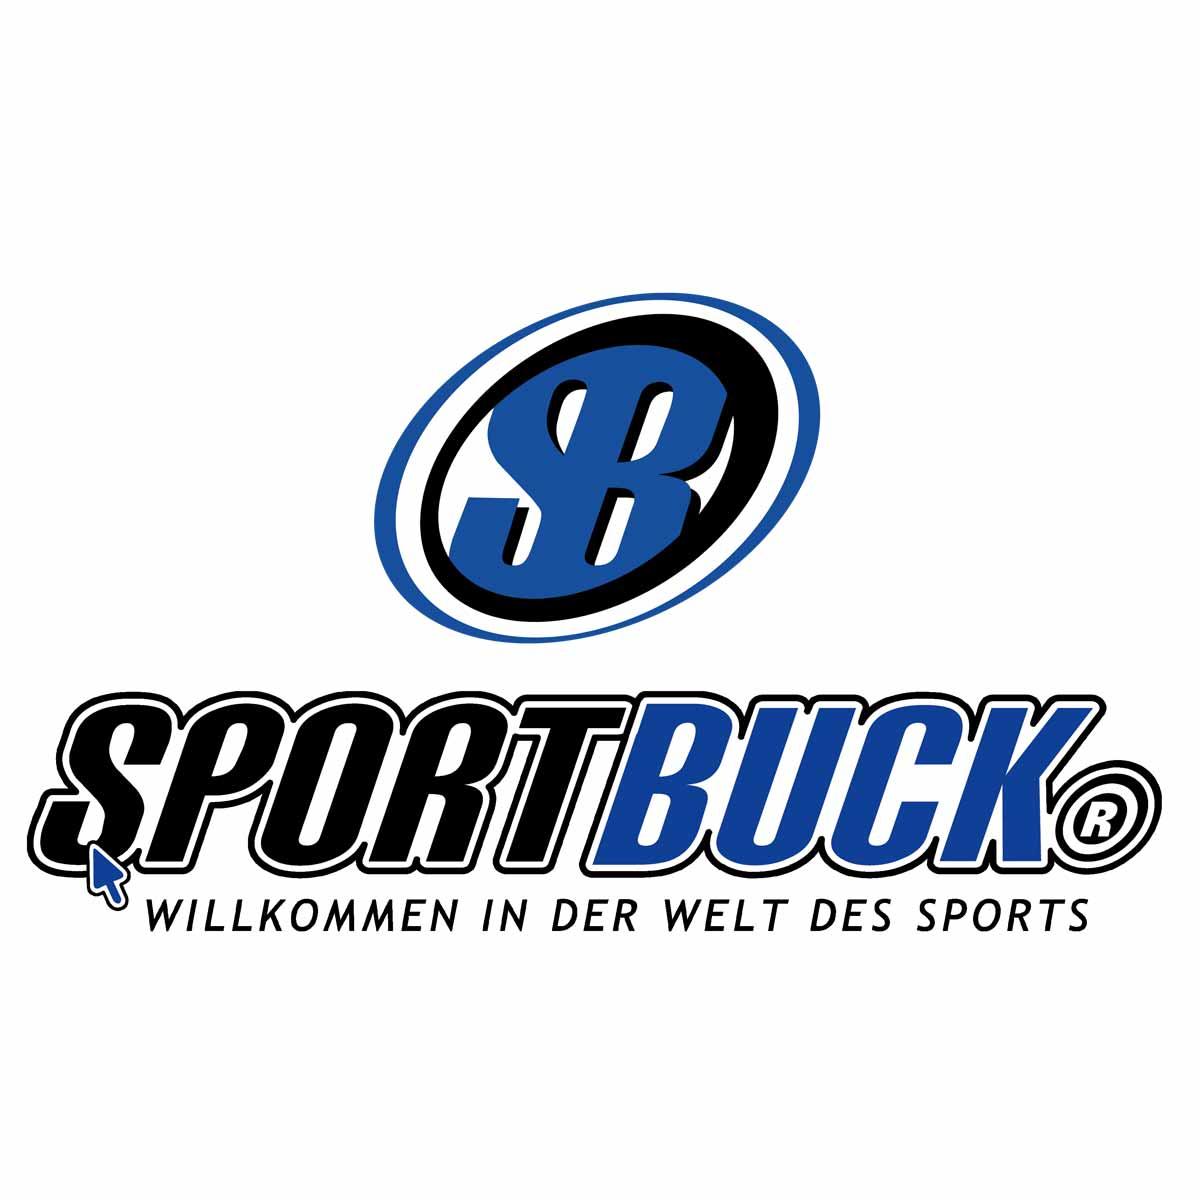 Angebote bei Sportbuck